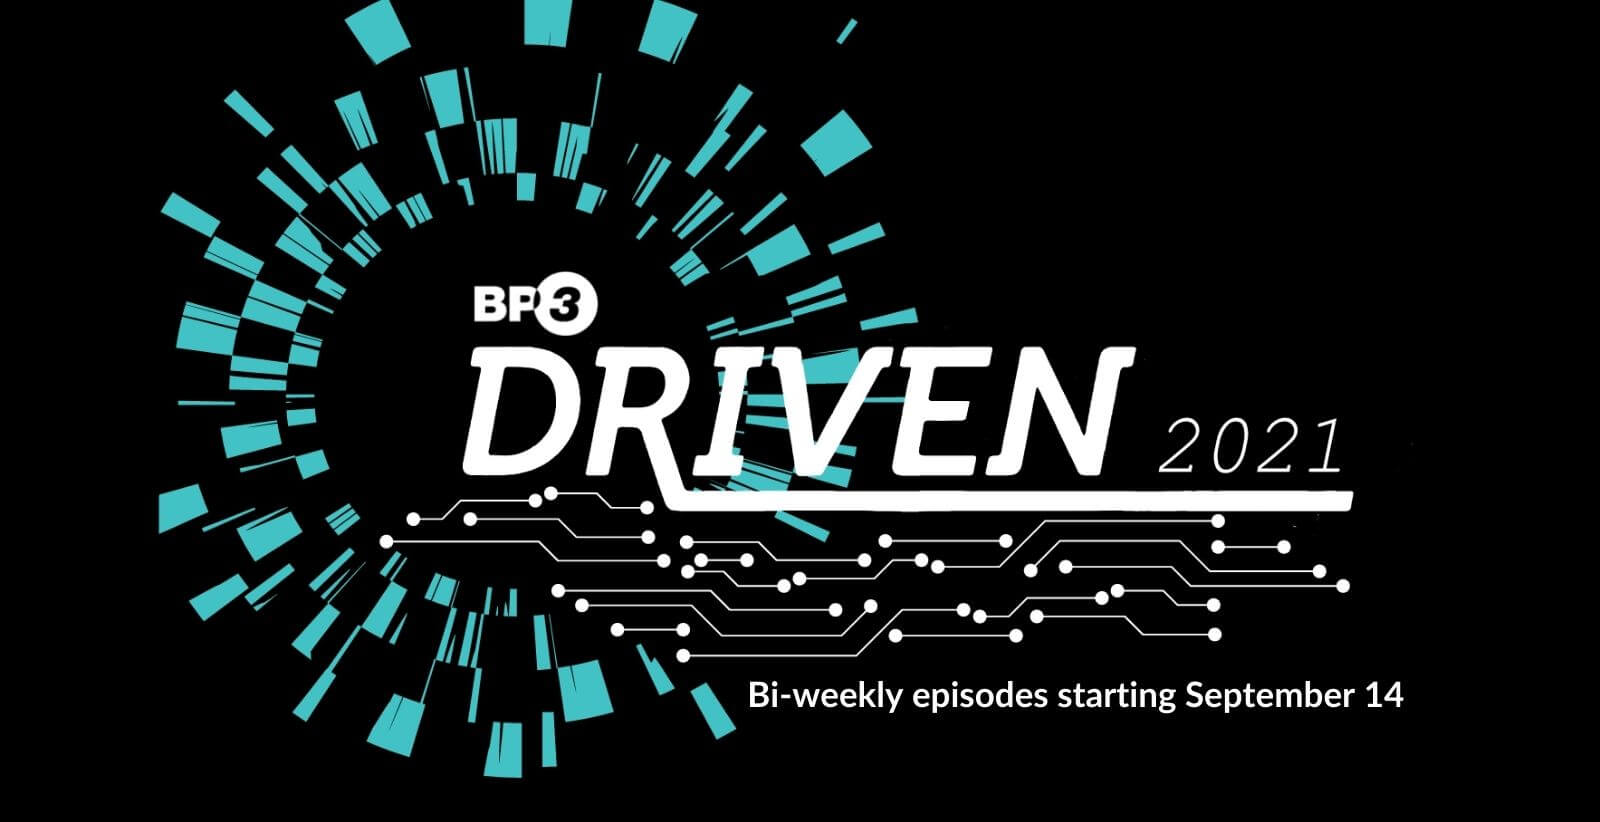 BP3 Global | Driven 2021